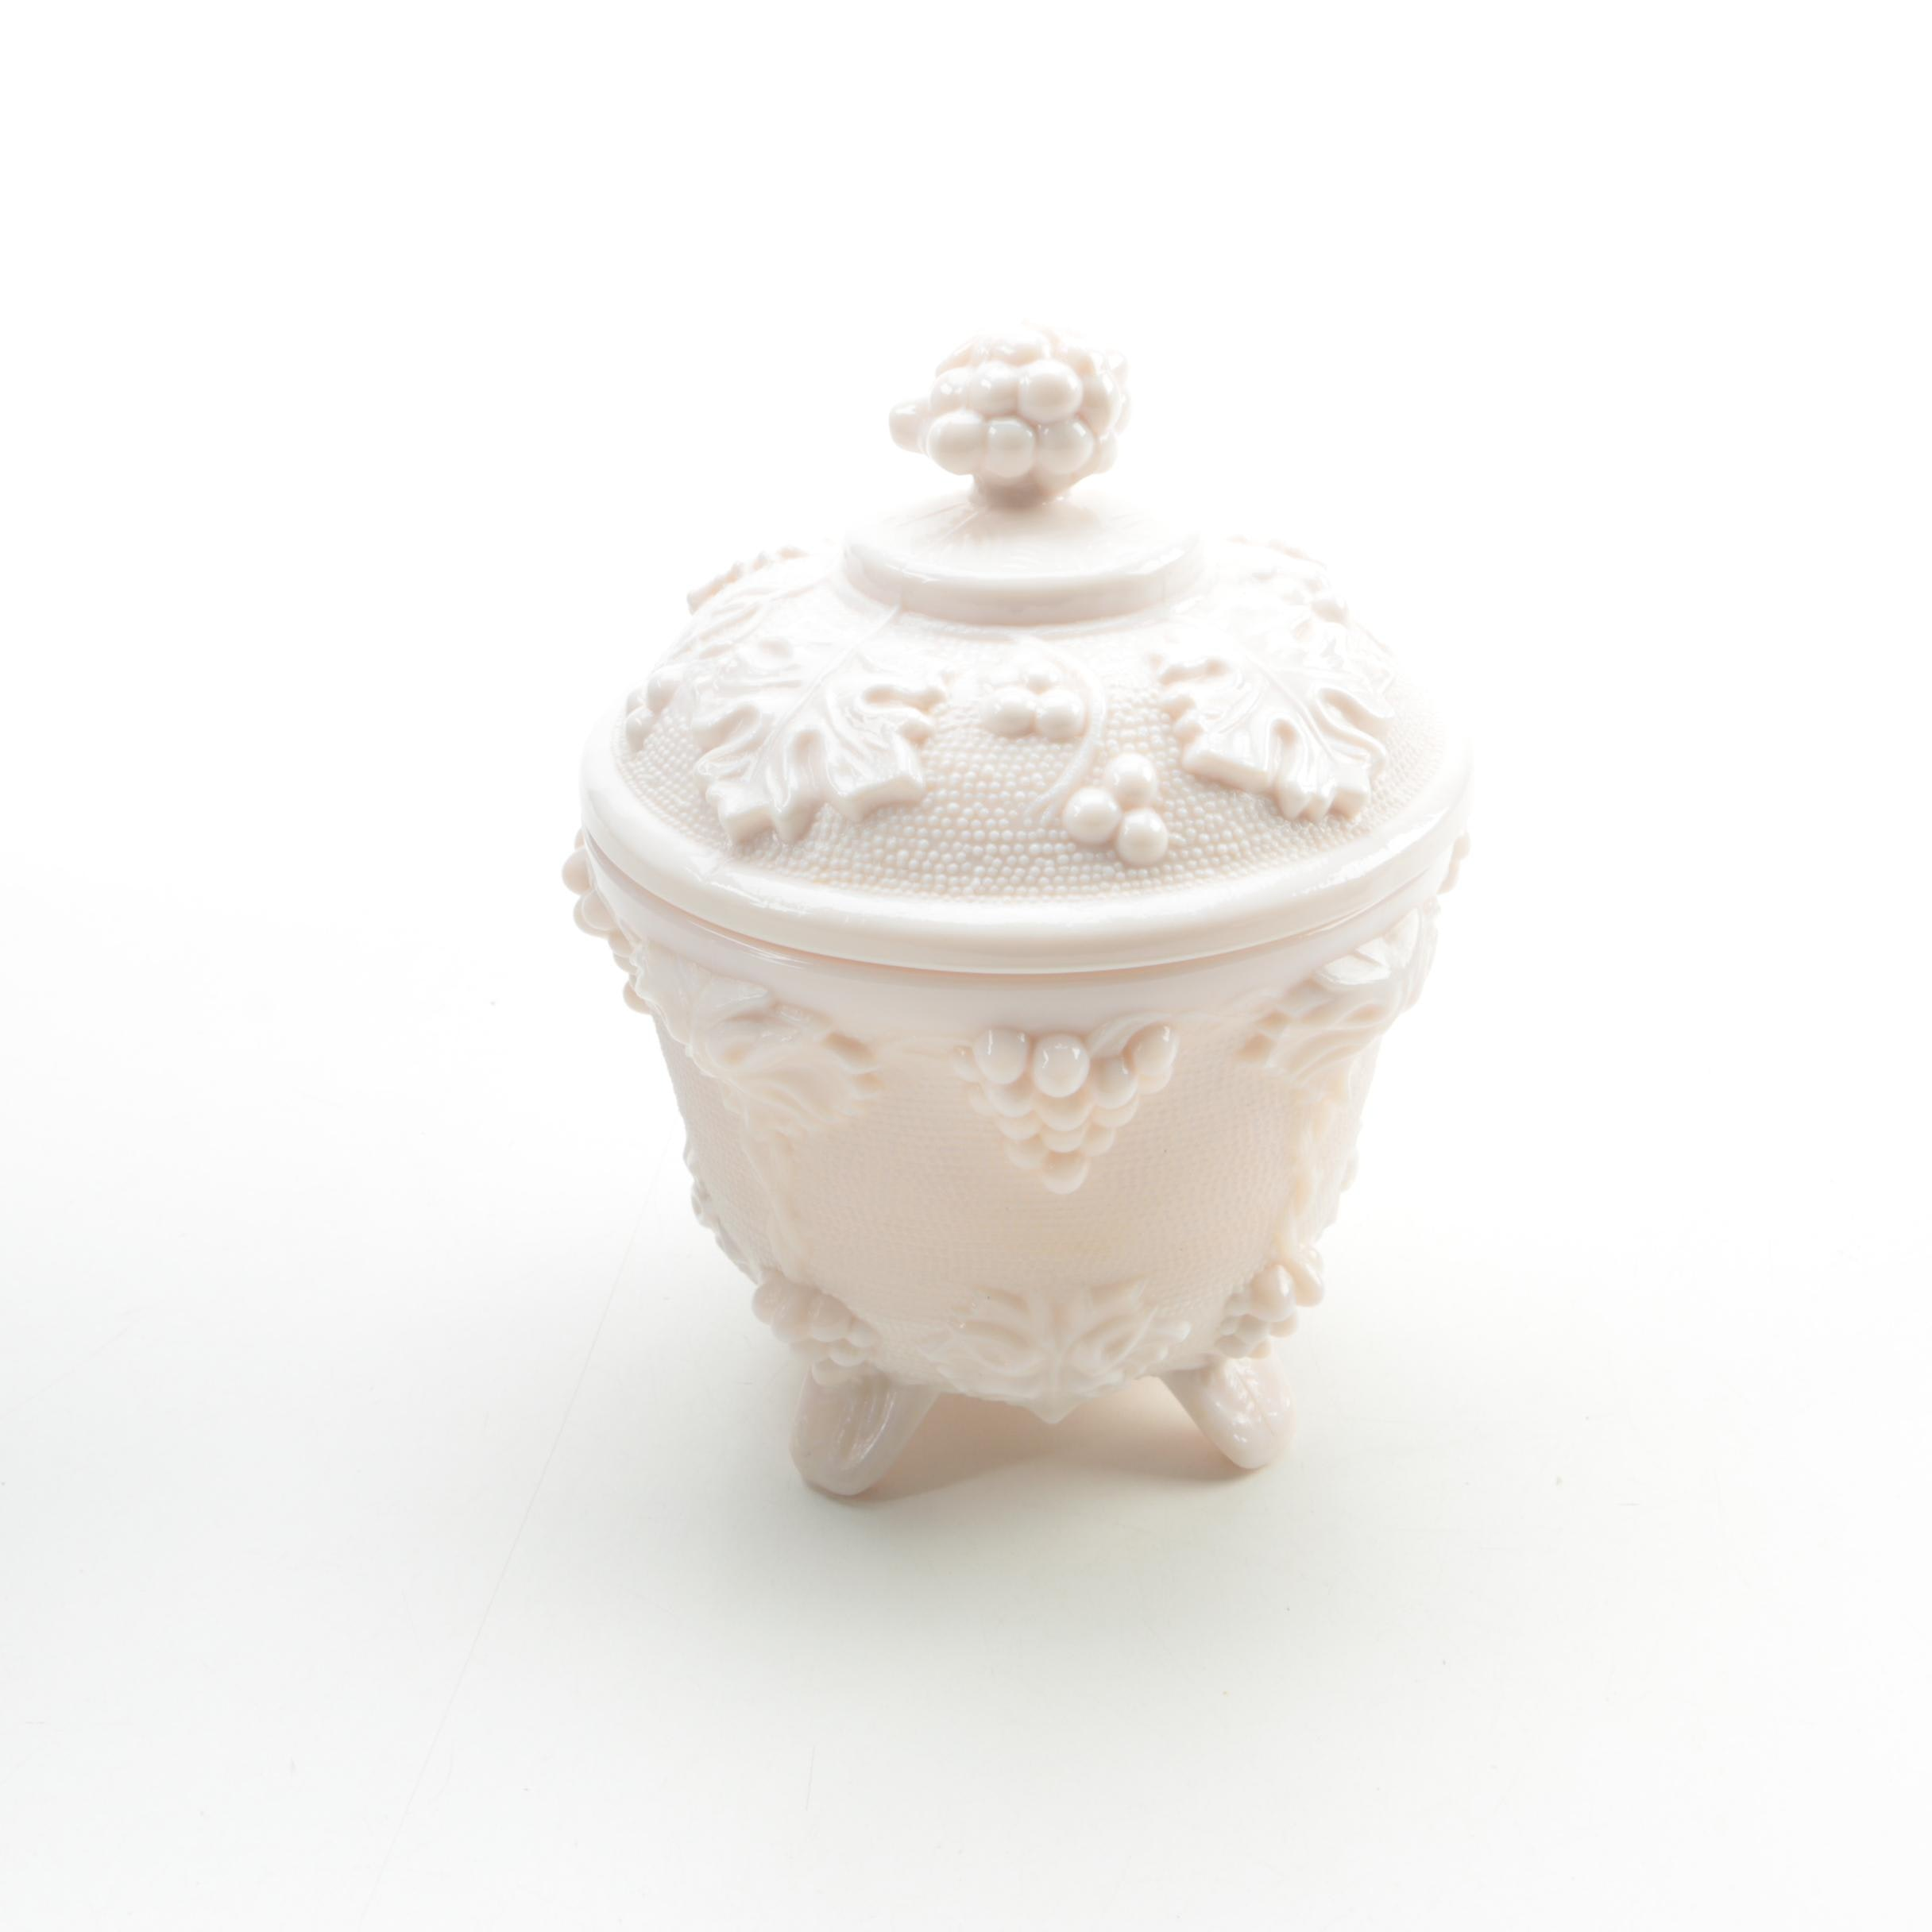 Ceramic Grape and Foliage Motif Container